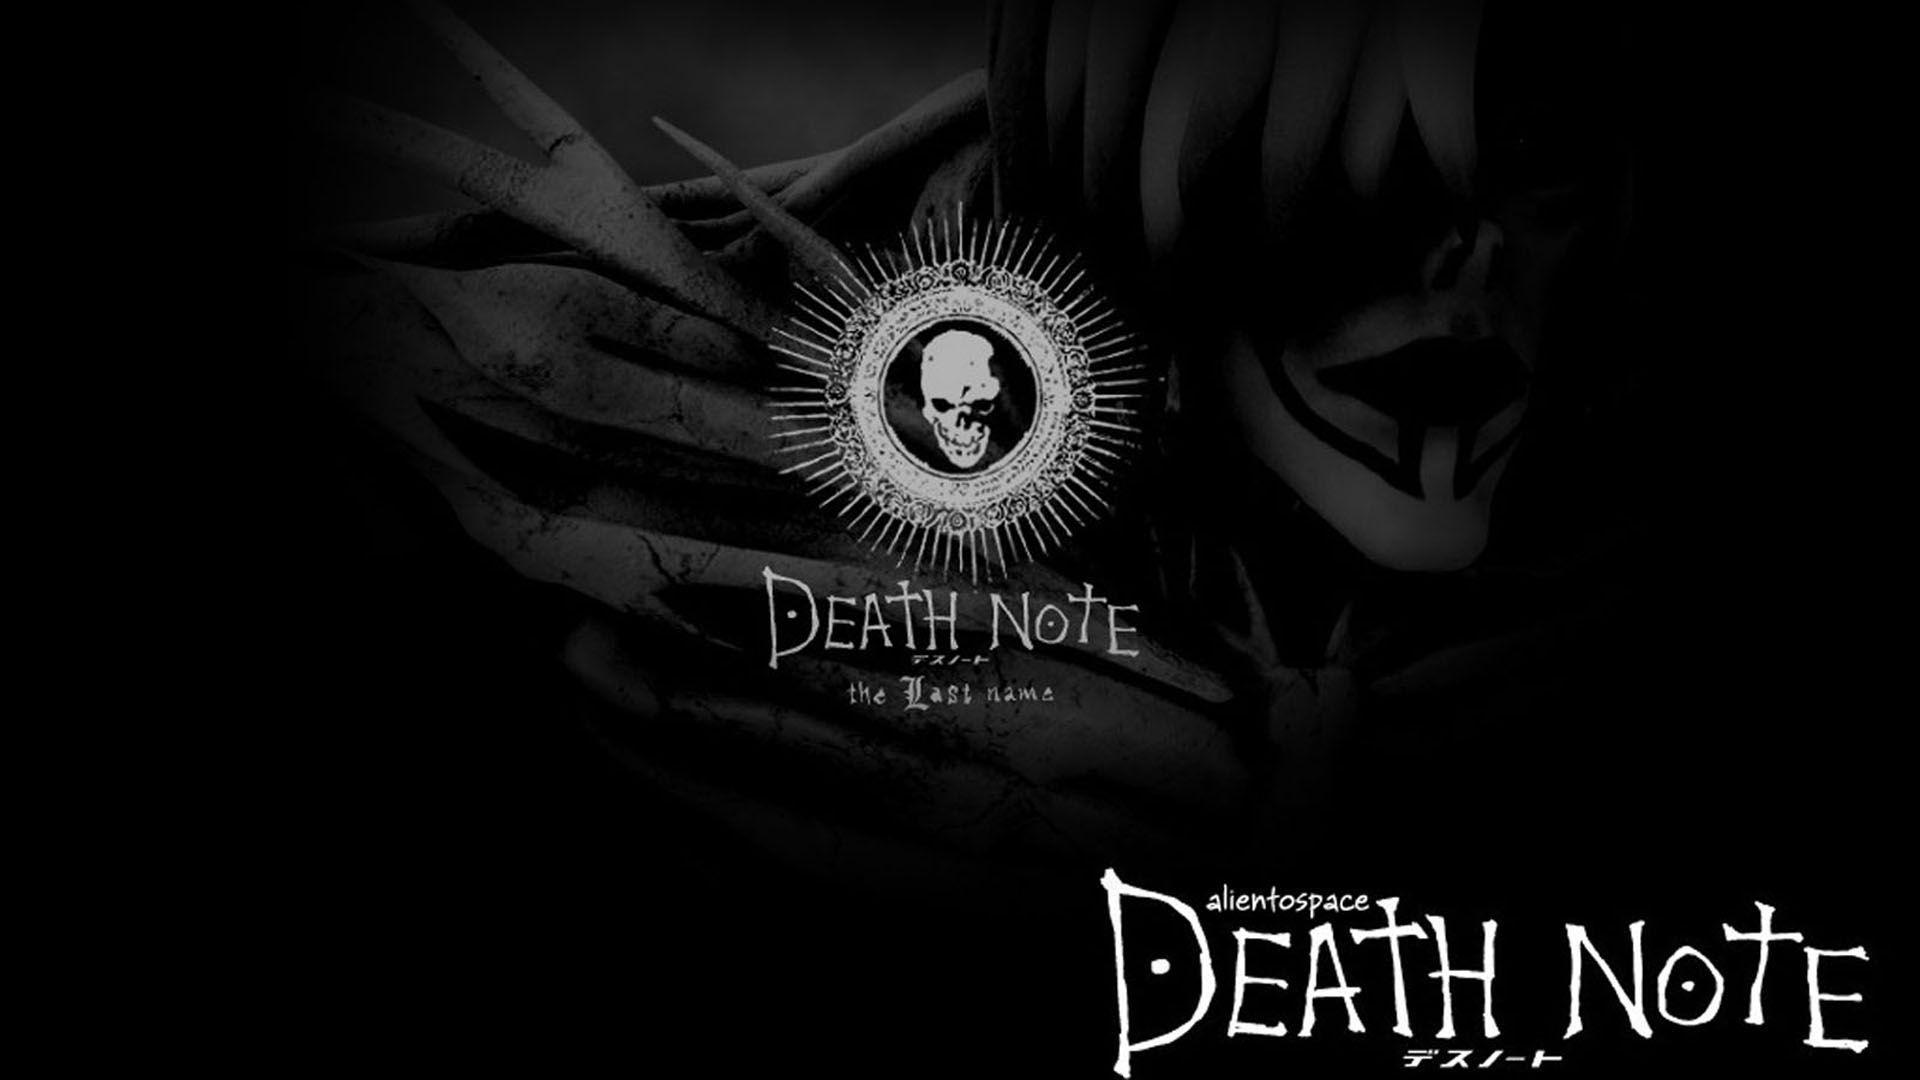 death note 1024x768 wallpaper - photo #46